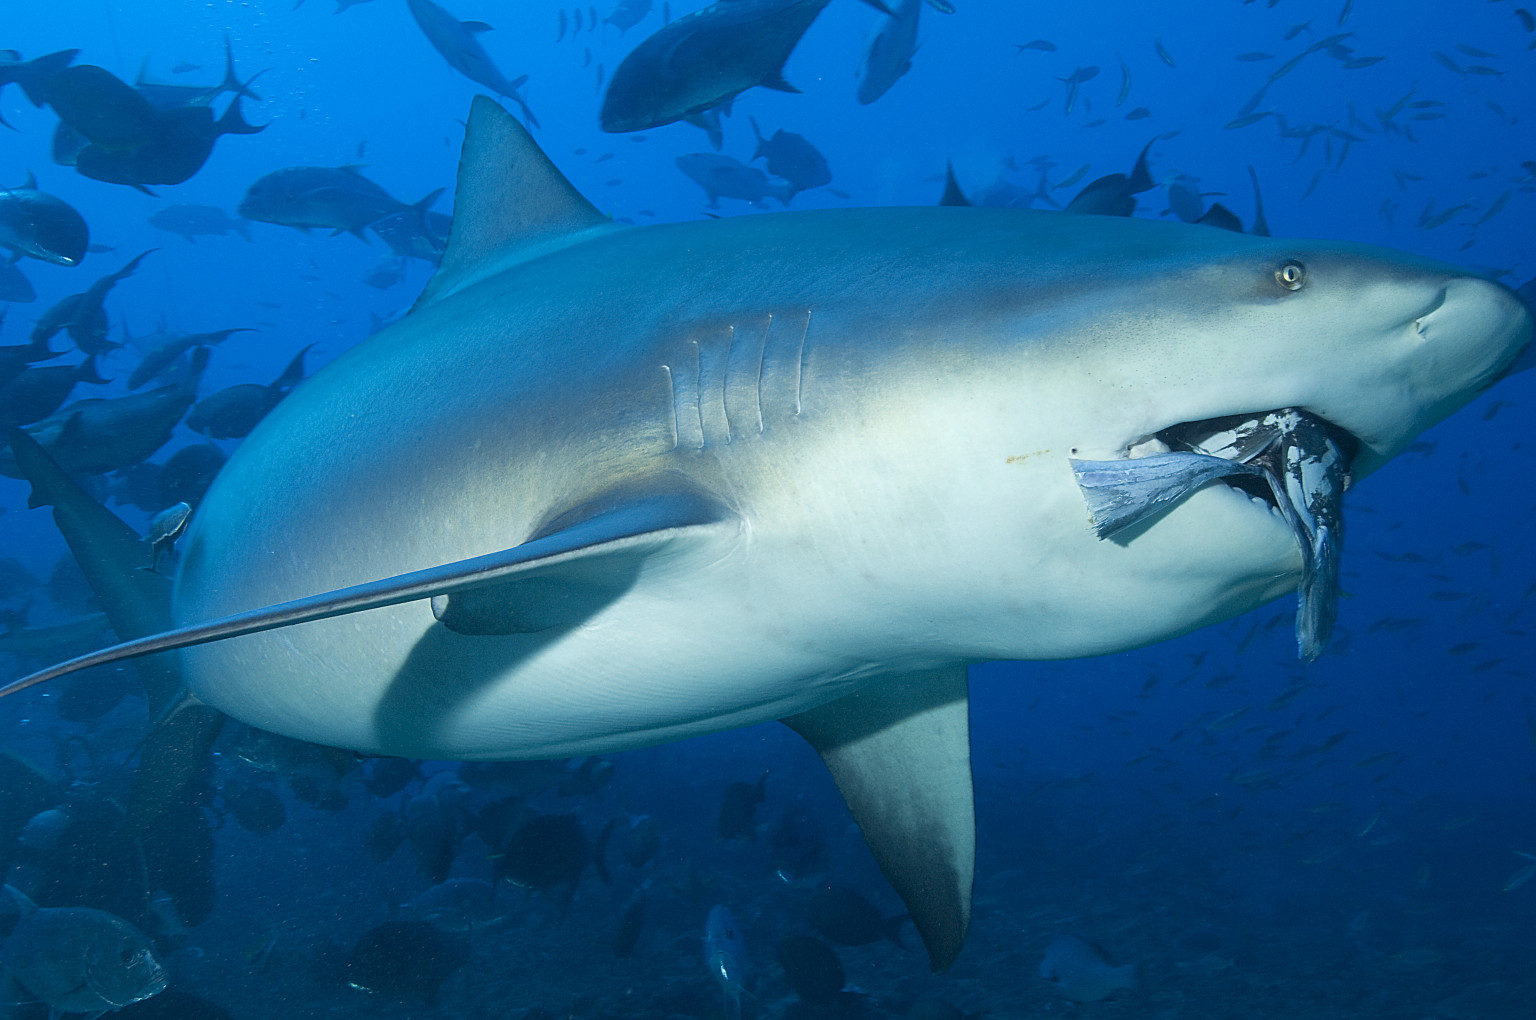 Bull Shark Bite - Viewing Gallery